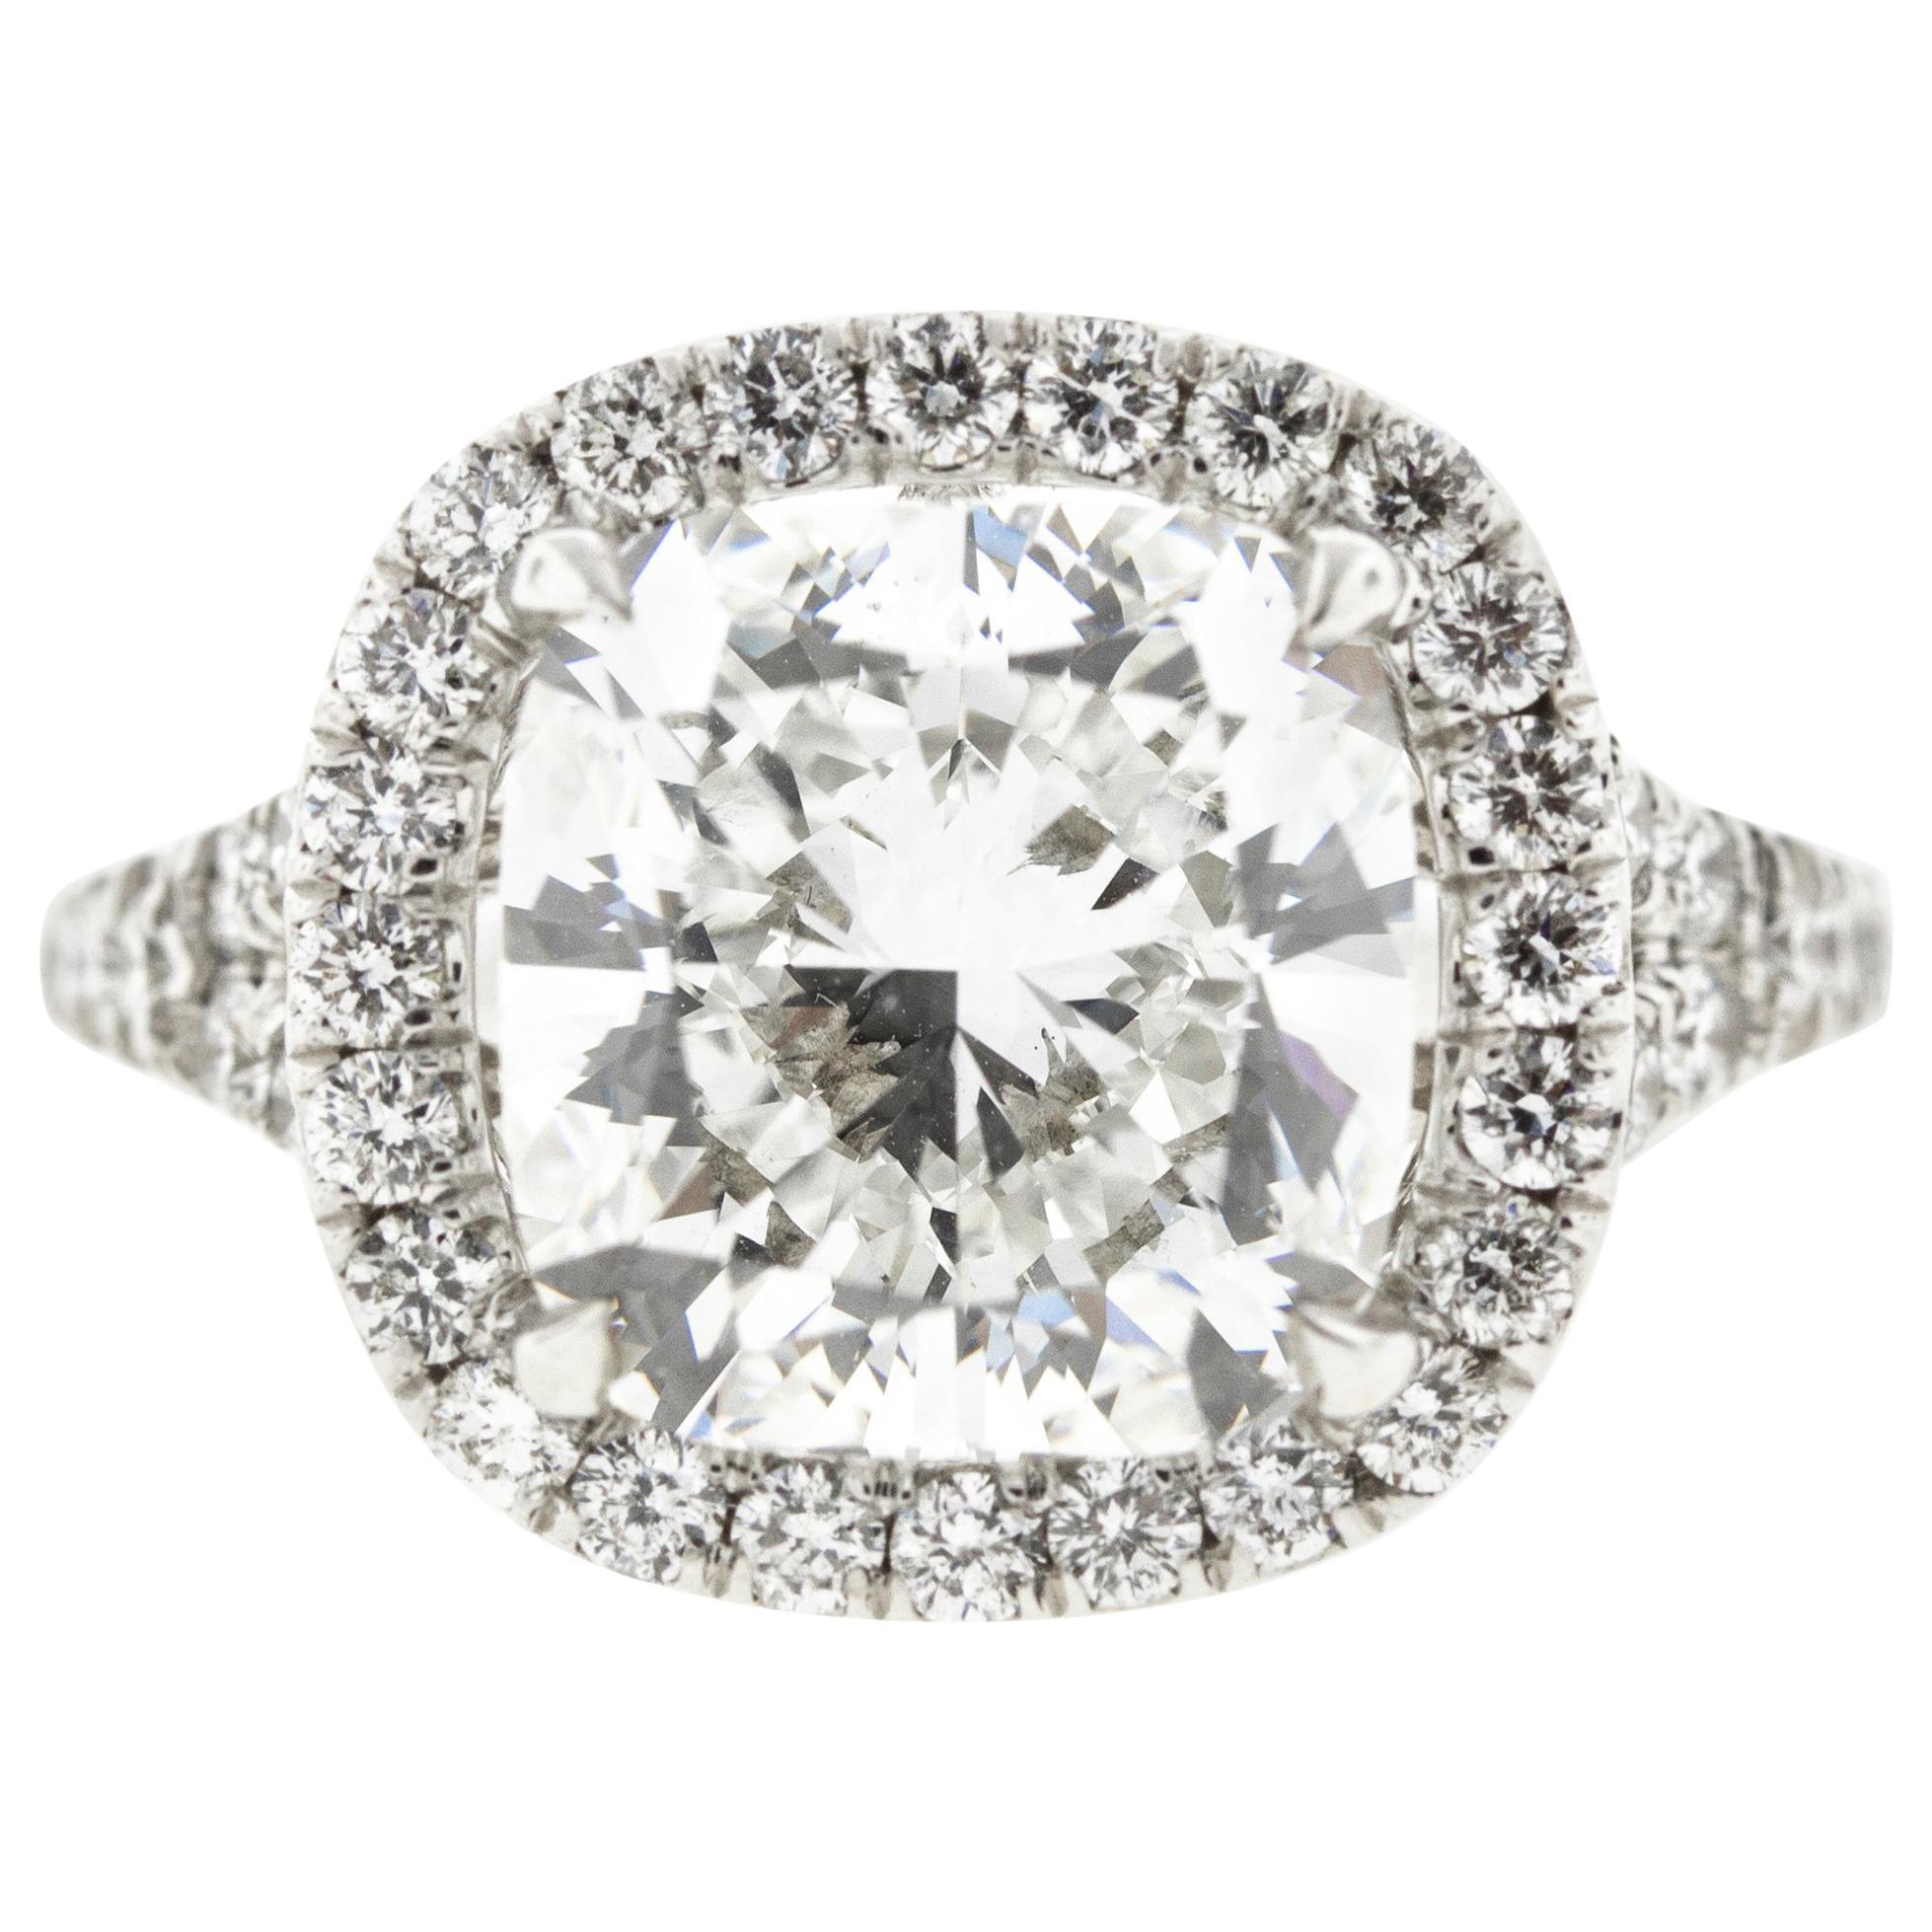 Cushion Diamond Halo Engagement Ring, GIA Certified